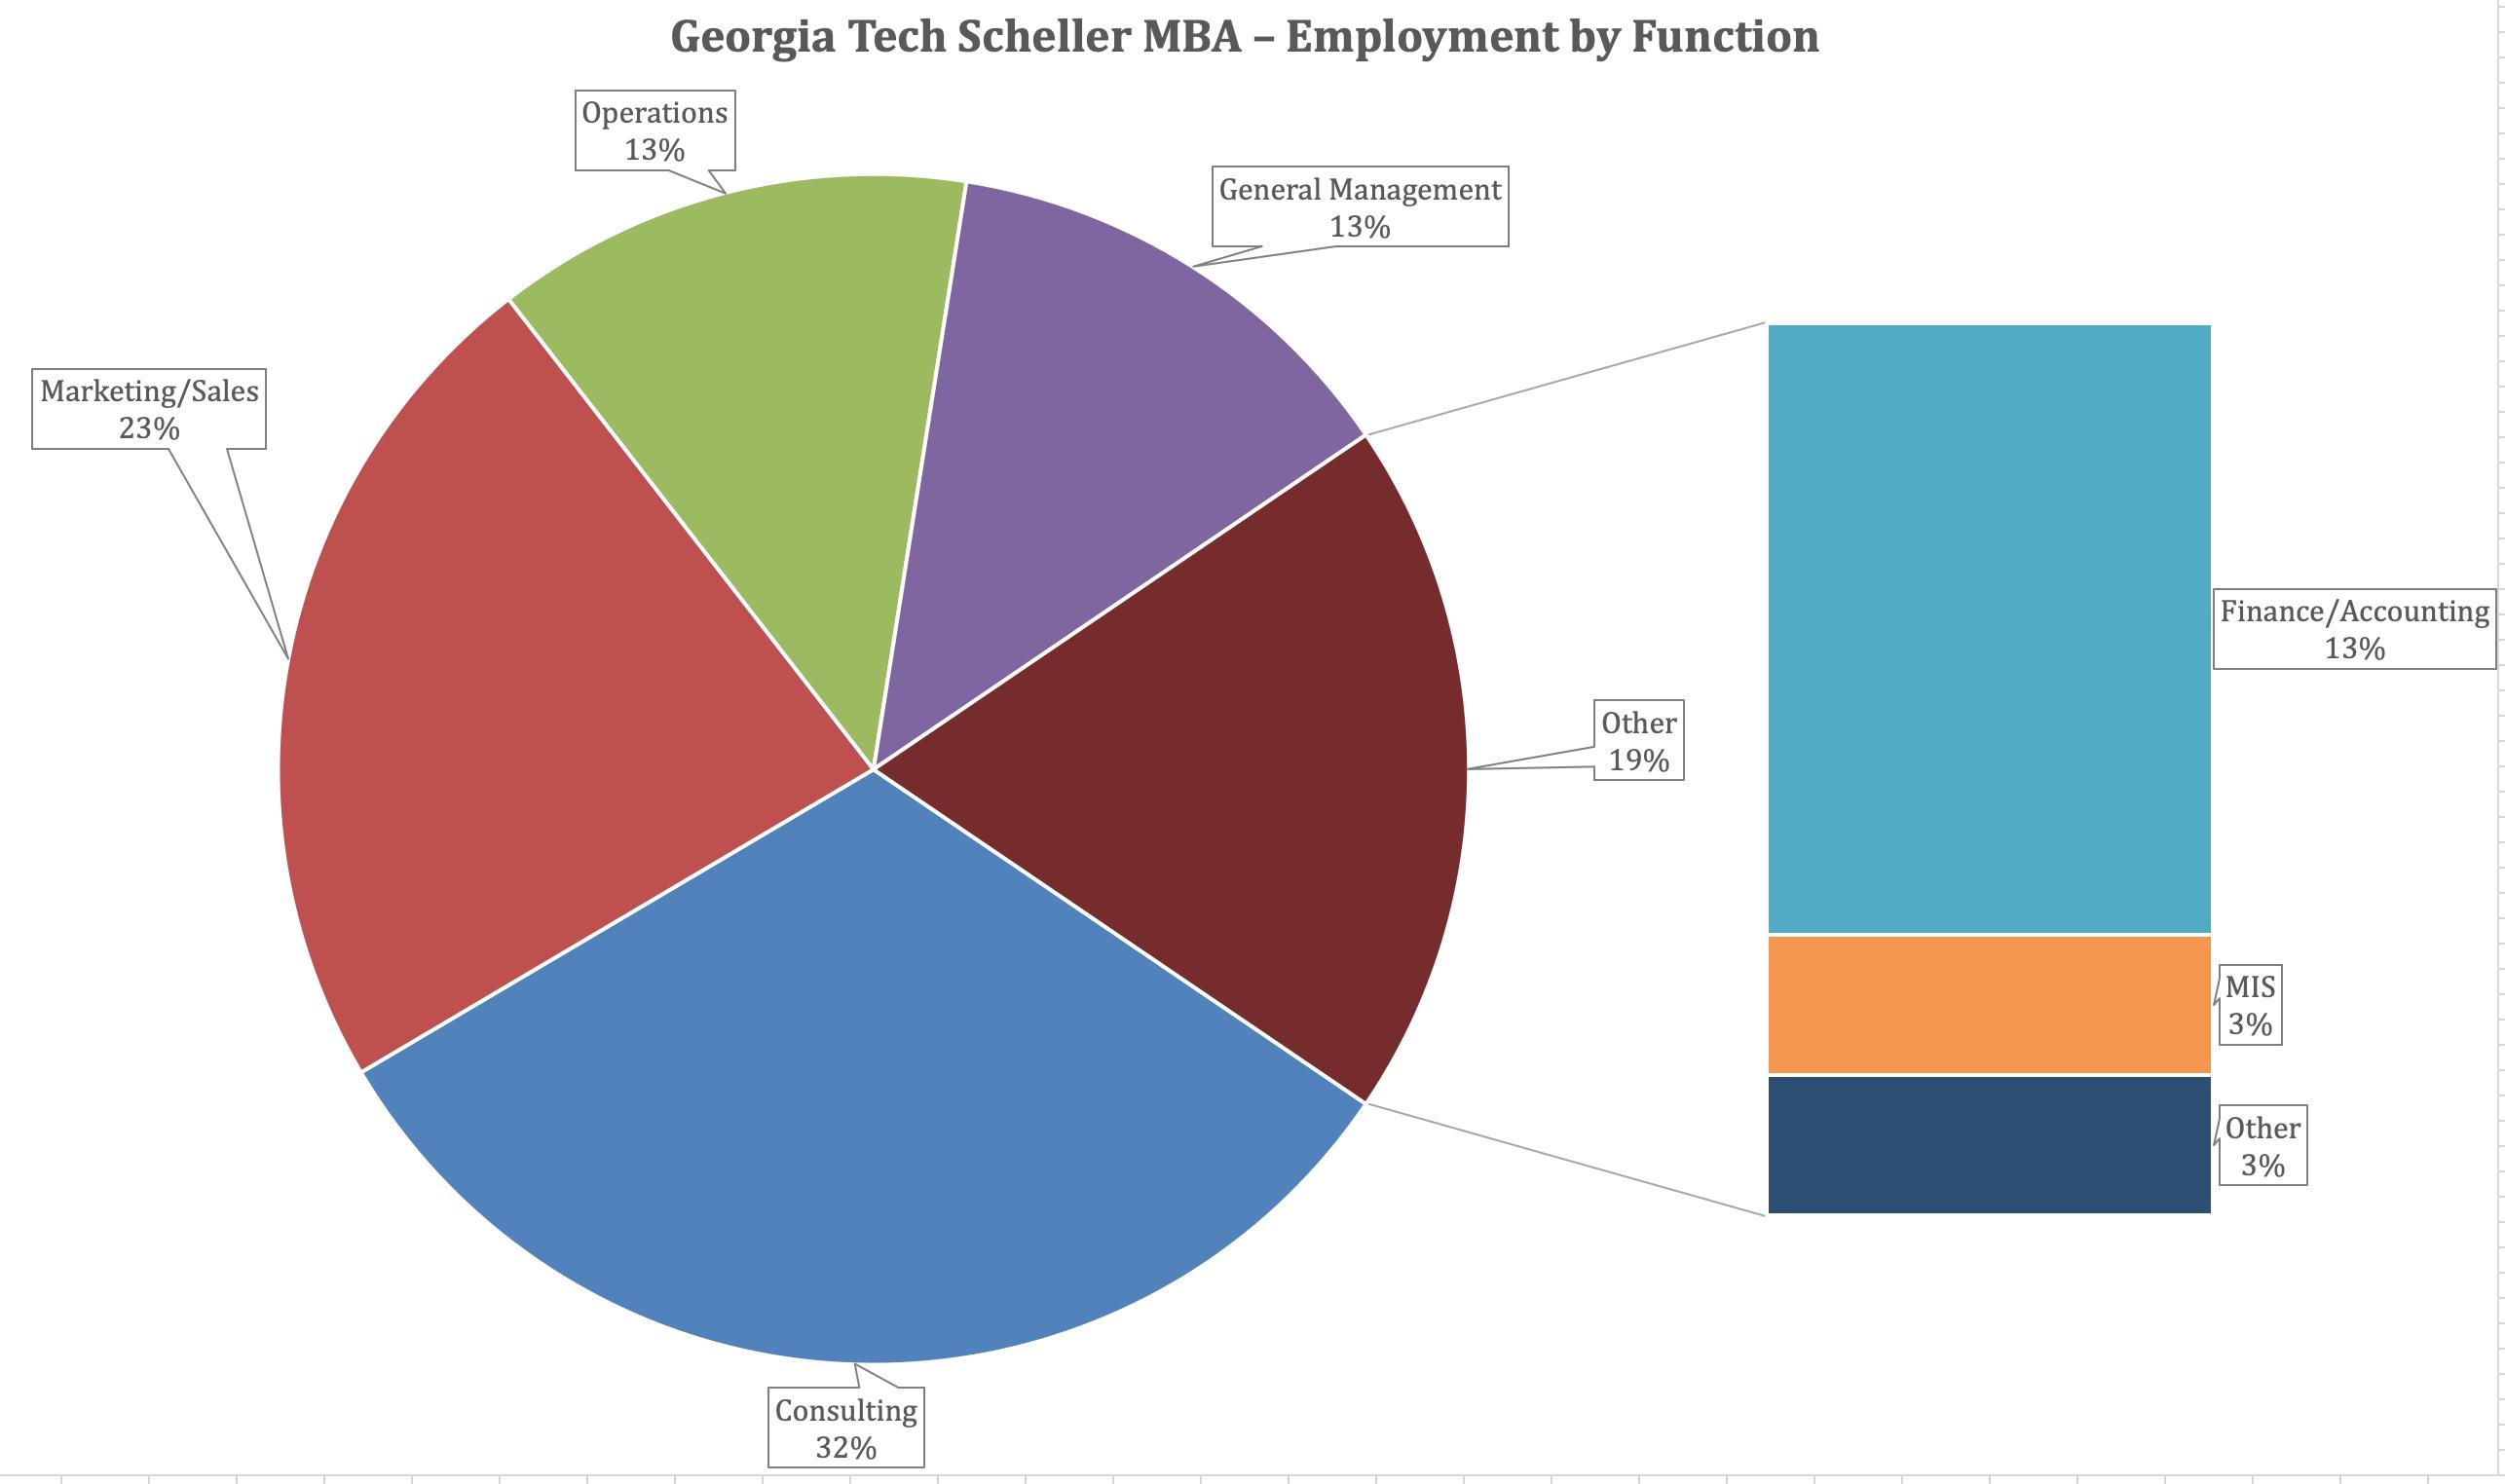 Georgia Tech Scheller MBA Program - Employment by Function